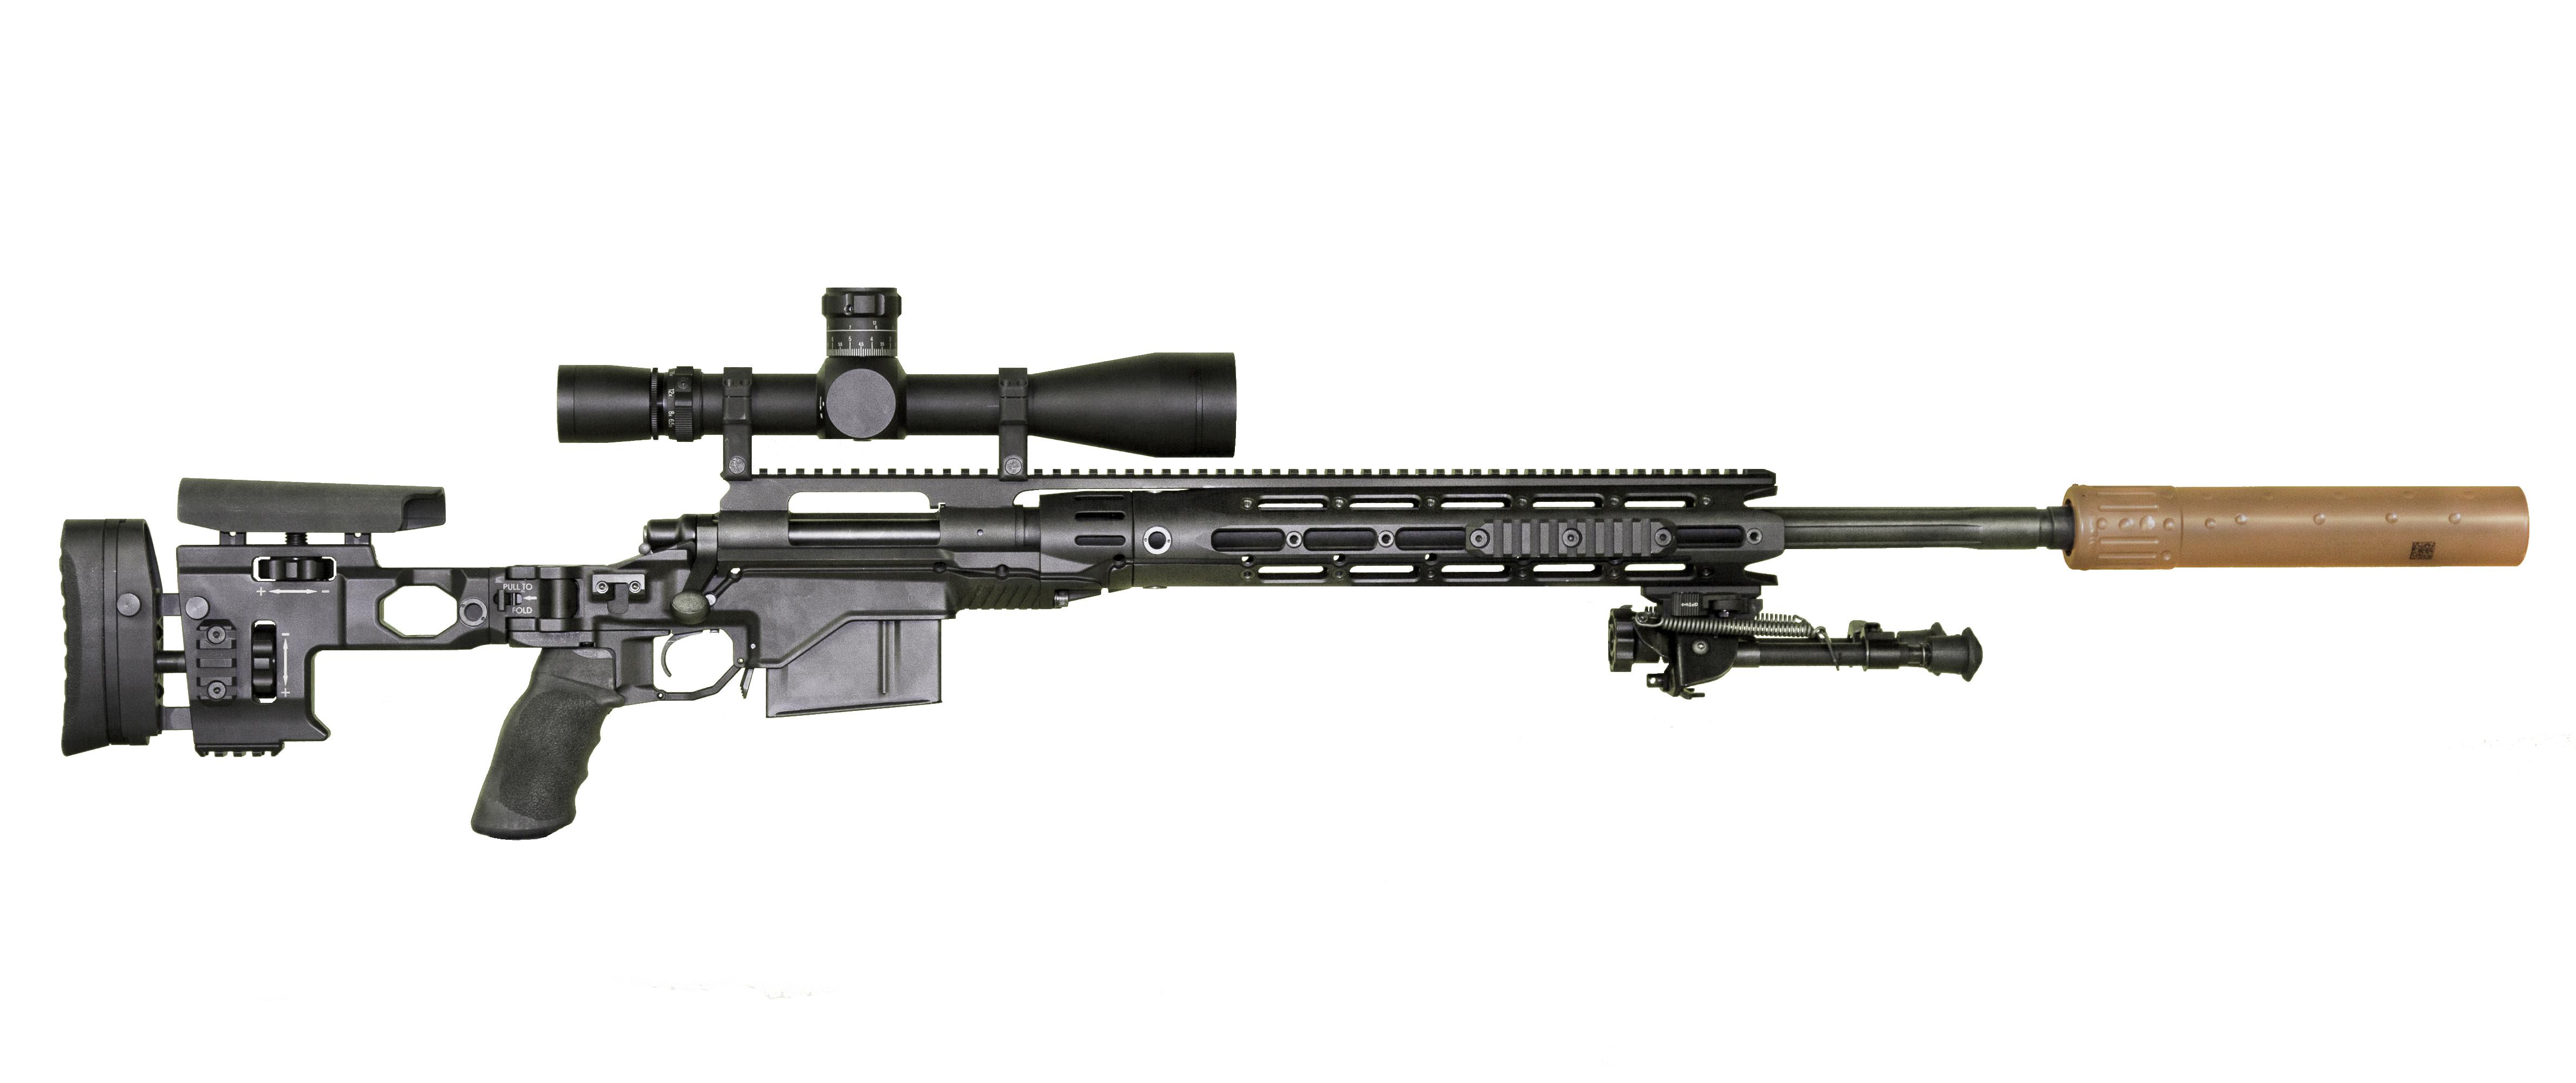 M2010 Enhanced Sniper Rifle